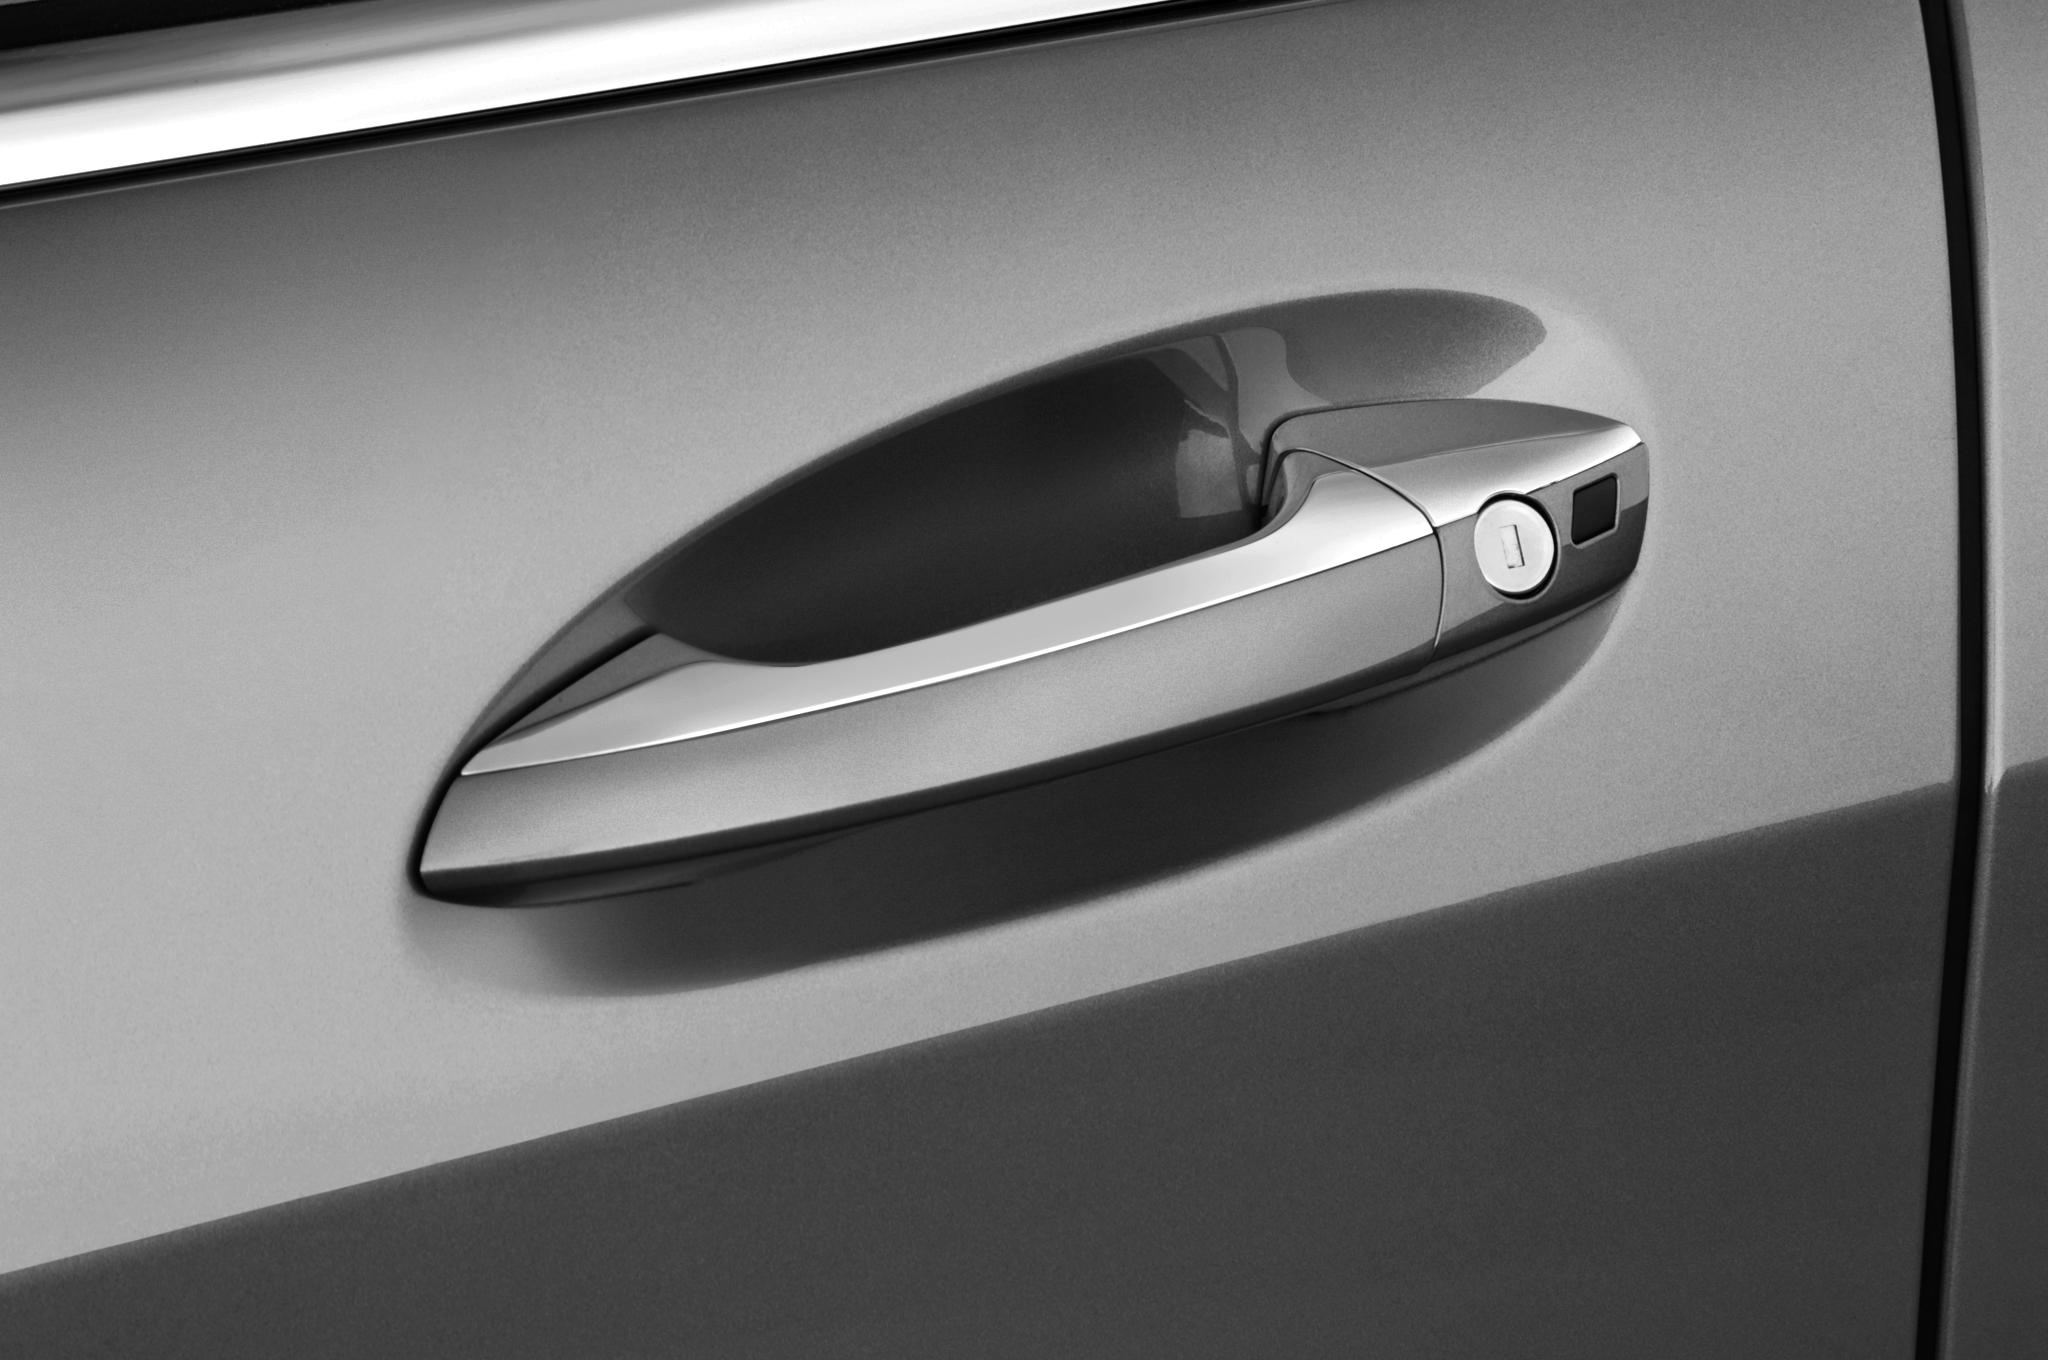 2010 Mercedes Benz S400 Hybrid Luxury Sedan C Class Fuse Box 7 50